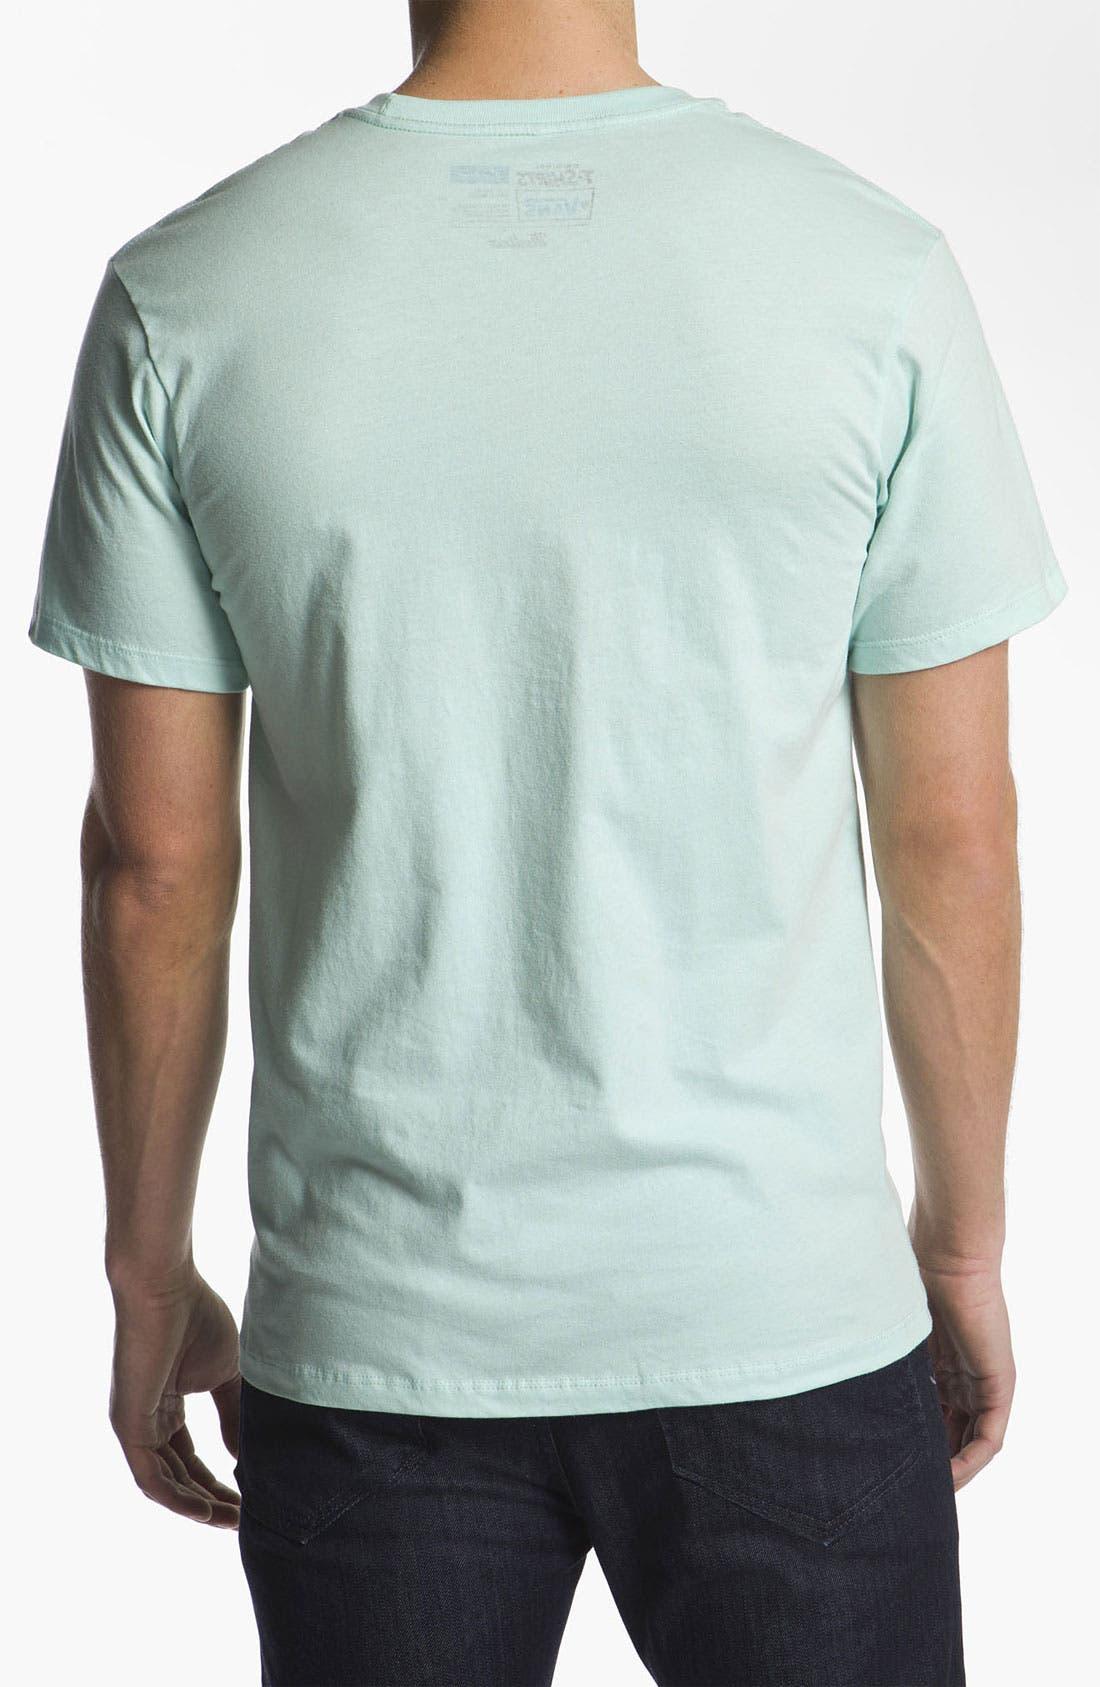 Alternate Image 2  - Vans 'Pipe Cleaner' T-Shirt